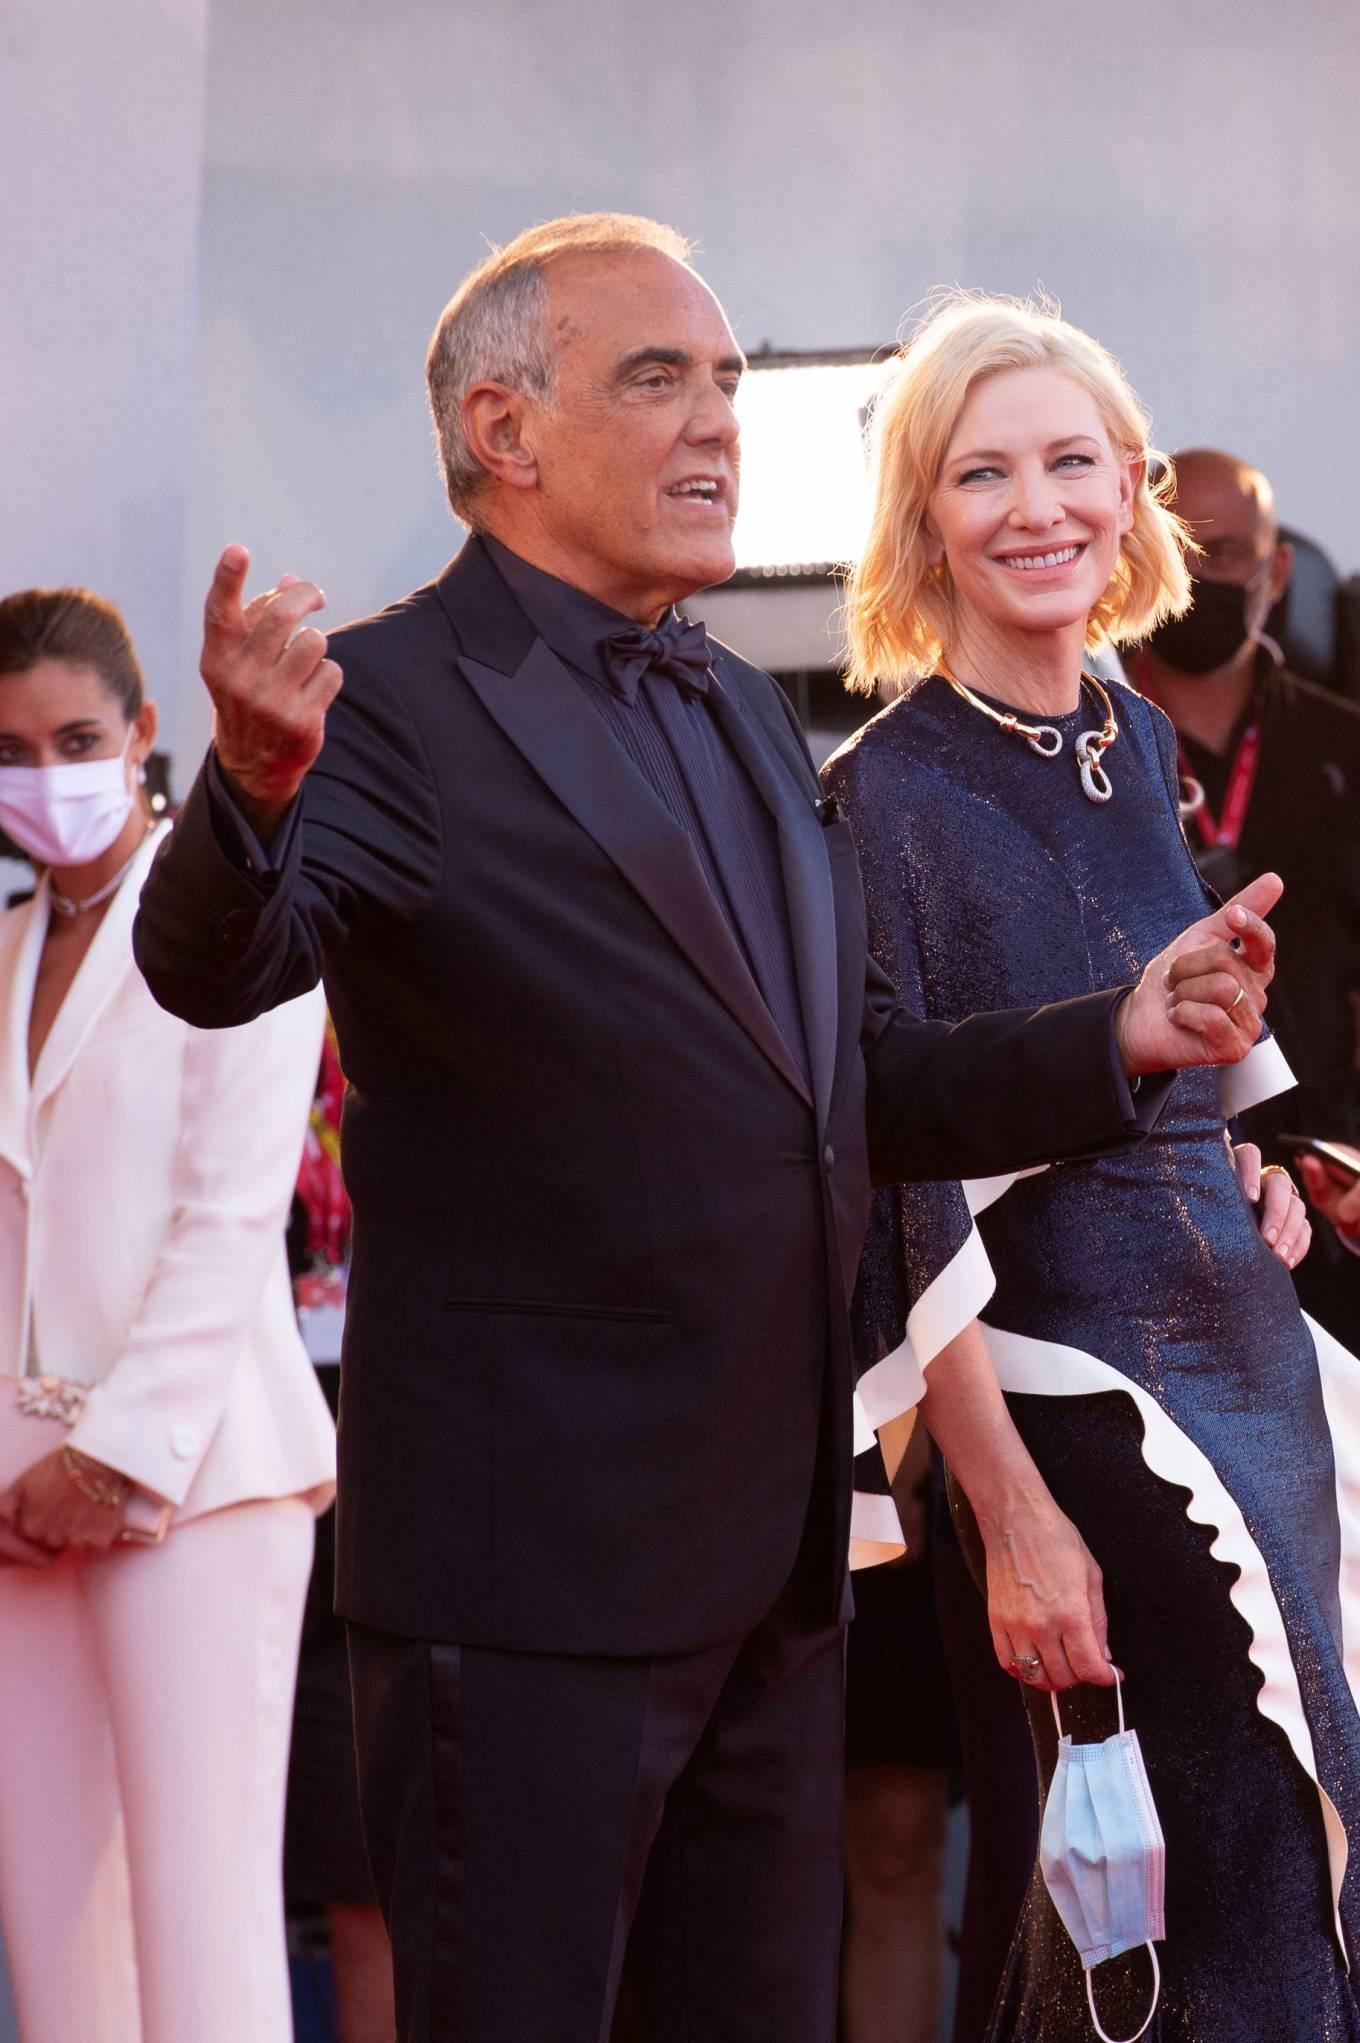 Cate Blanchett 2020 : Cate Blanchett attending Opening Ceremony at 2020 Venice International Film Festival – Italy-19